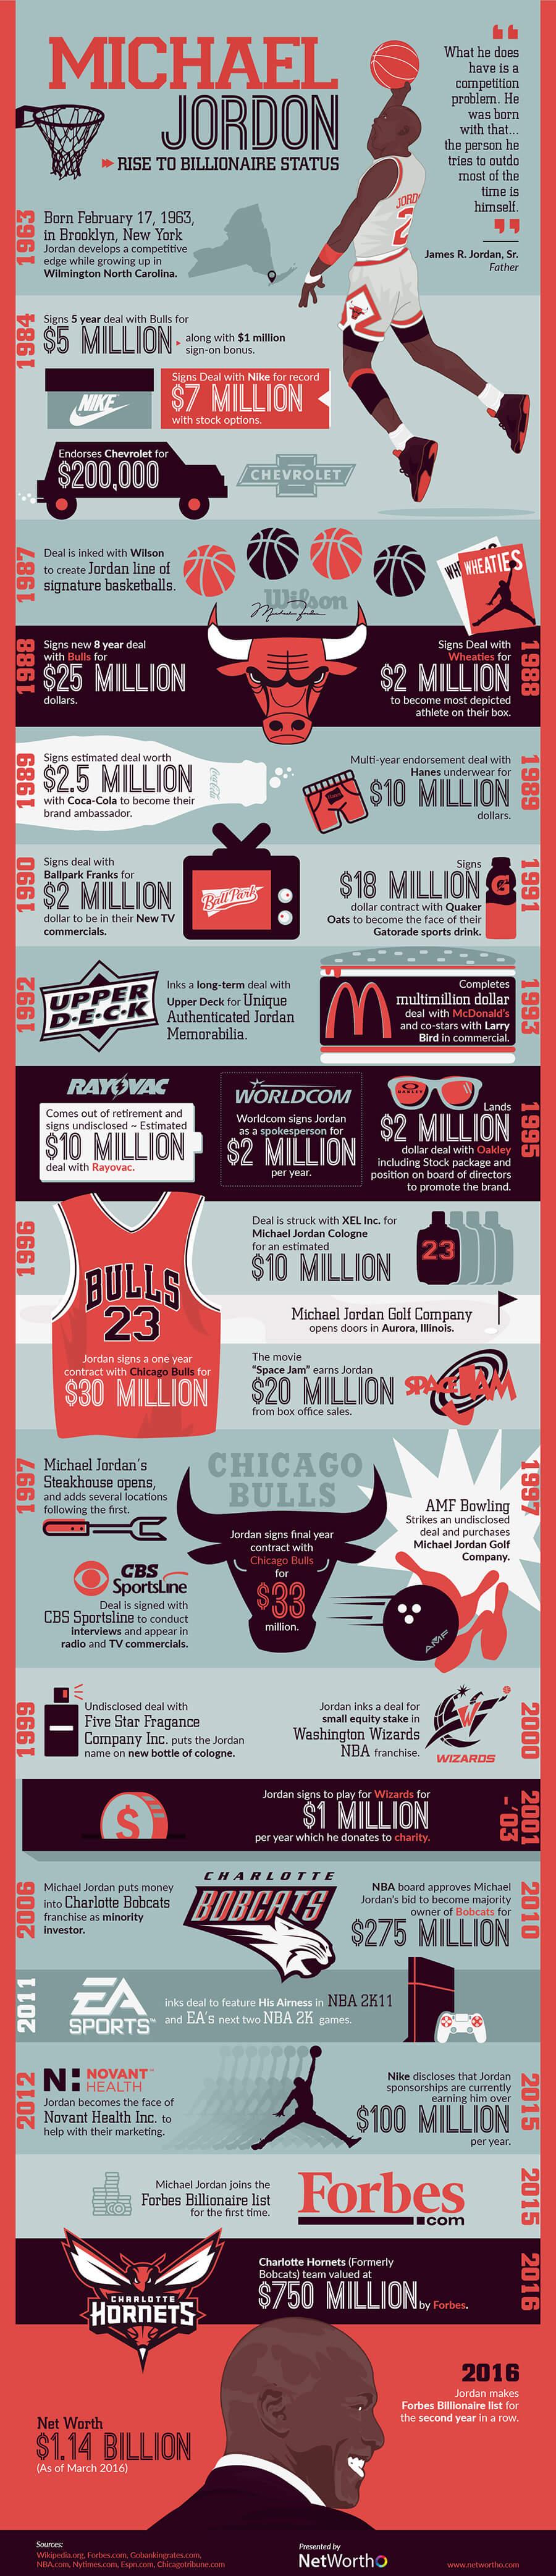 Michael Jordan Becomes Billionaire